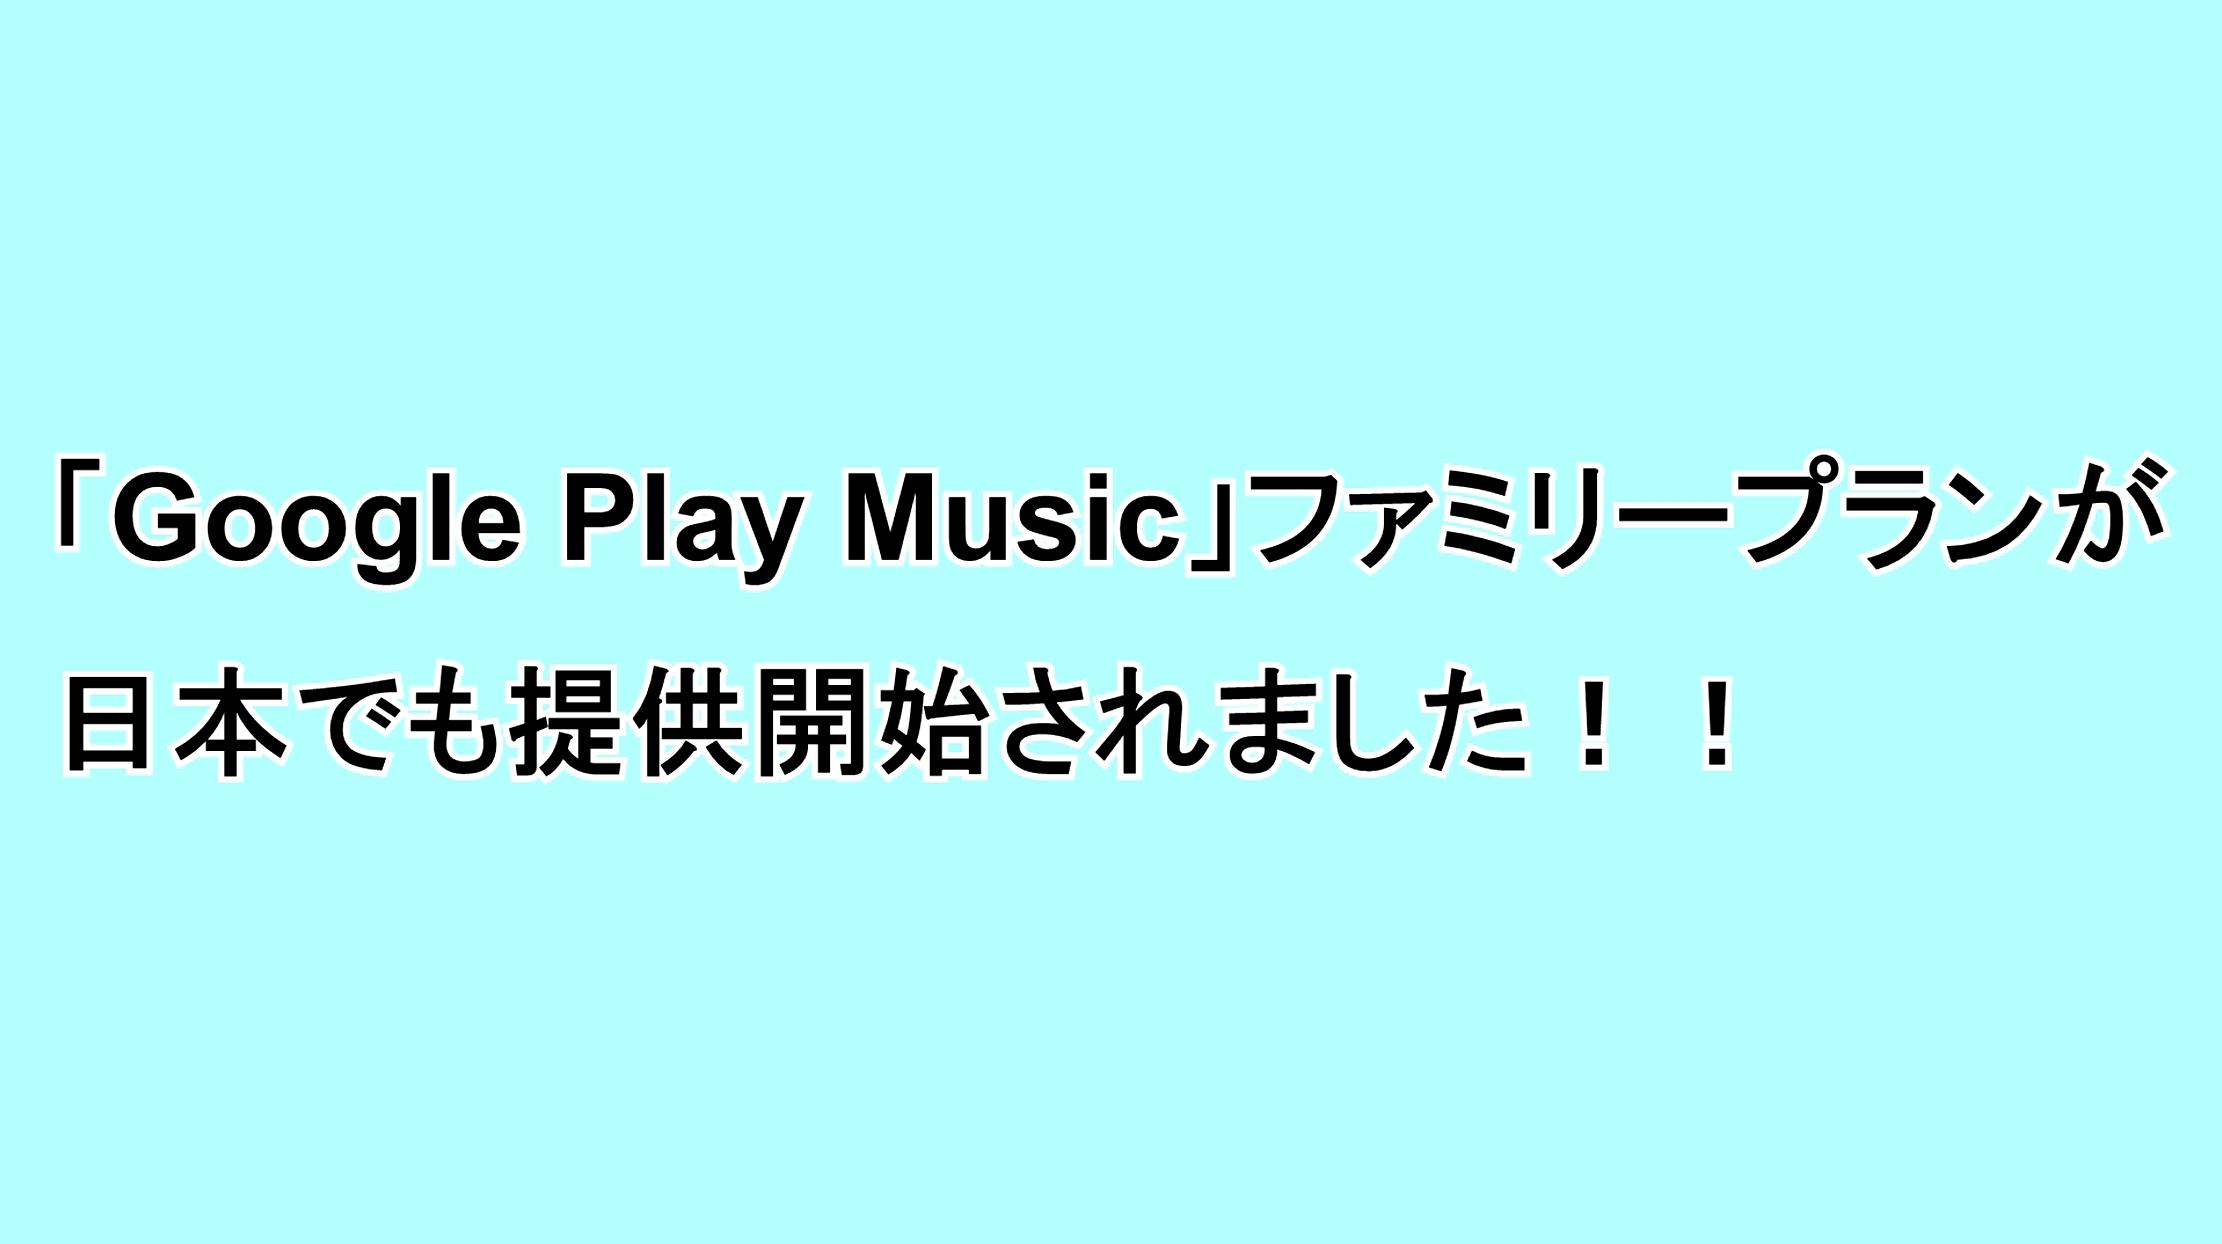 「Google Play Music」ファミリープランが日本でも提供開始されました